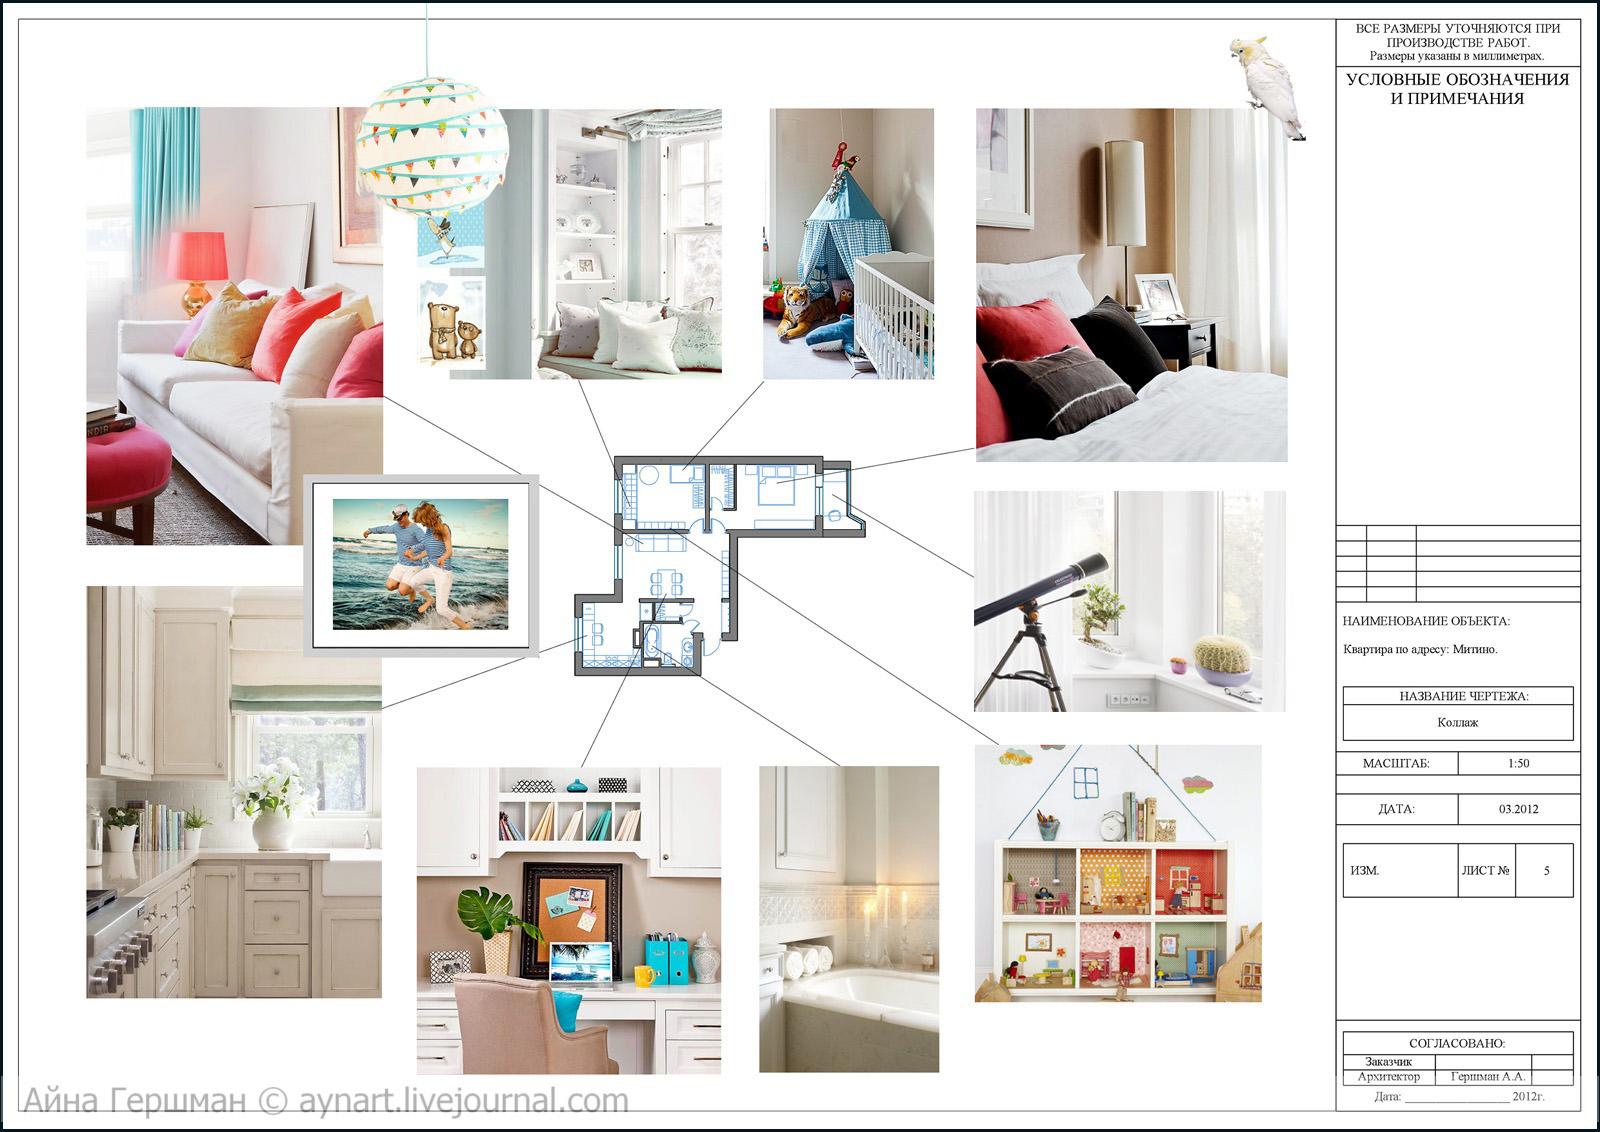 "Бизнес план пример дизайн интерьера "" Картинки и фотографии дизайна квартир, домов, коттеджей"